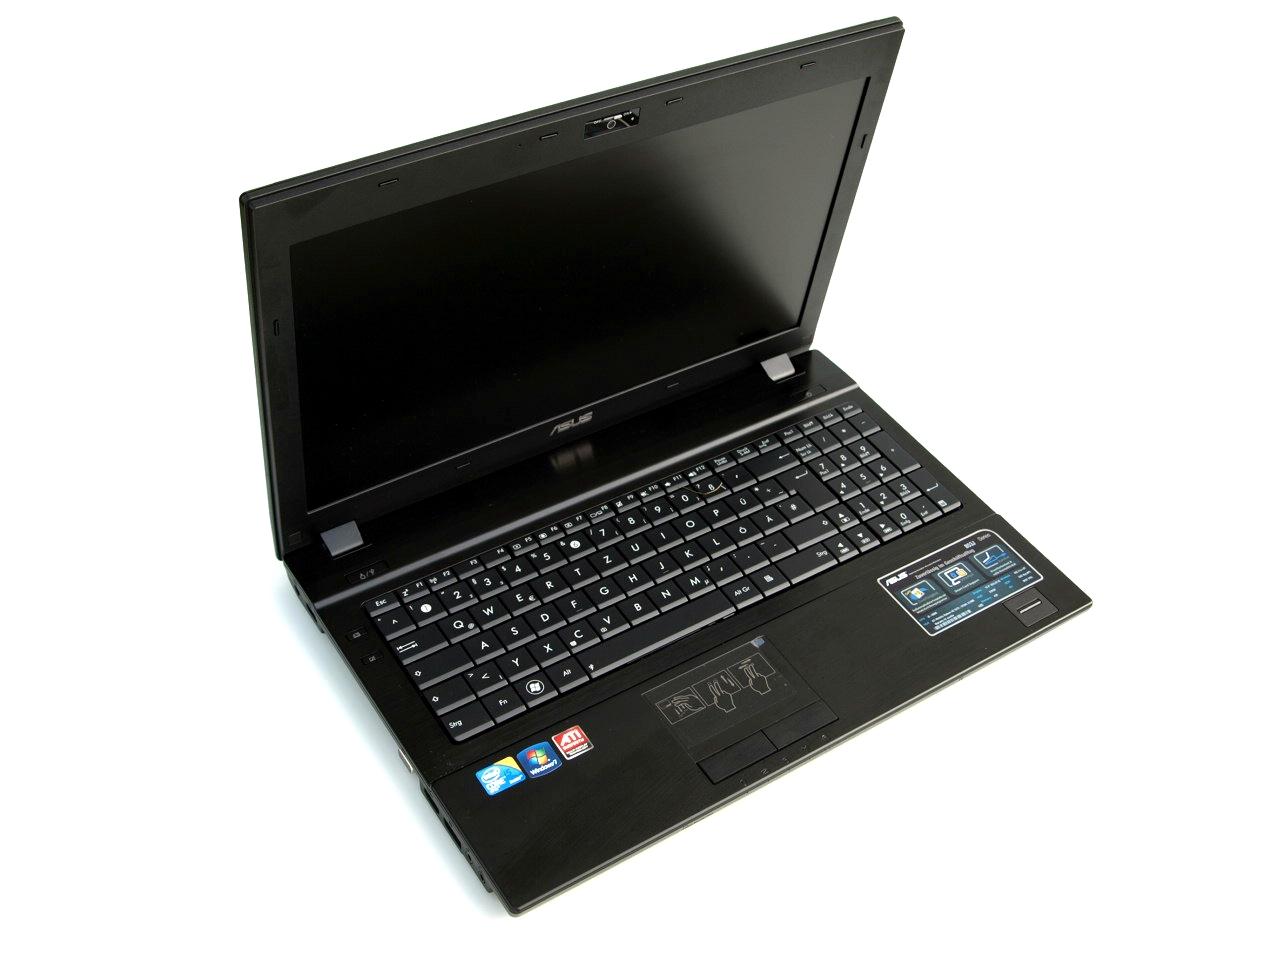 Asus B53J Notebook Windows 8 X64 Treiber